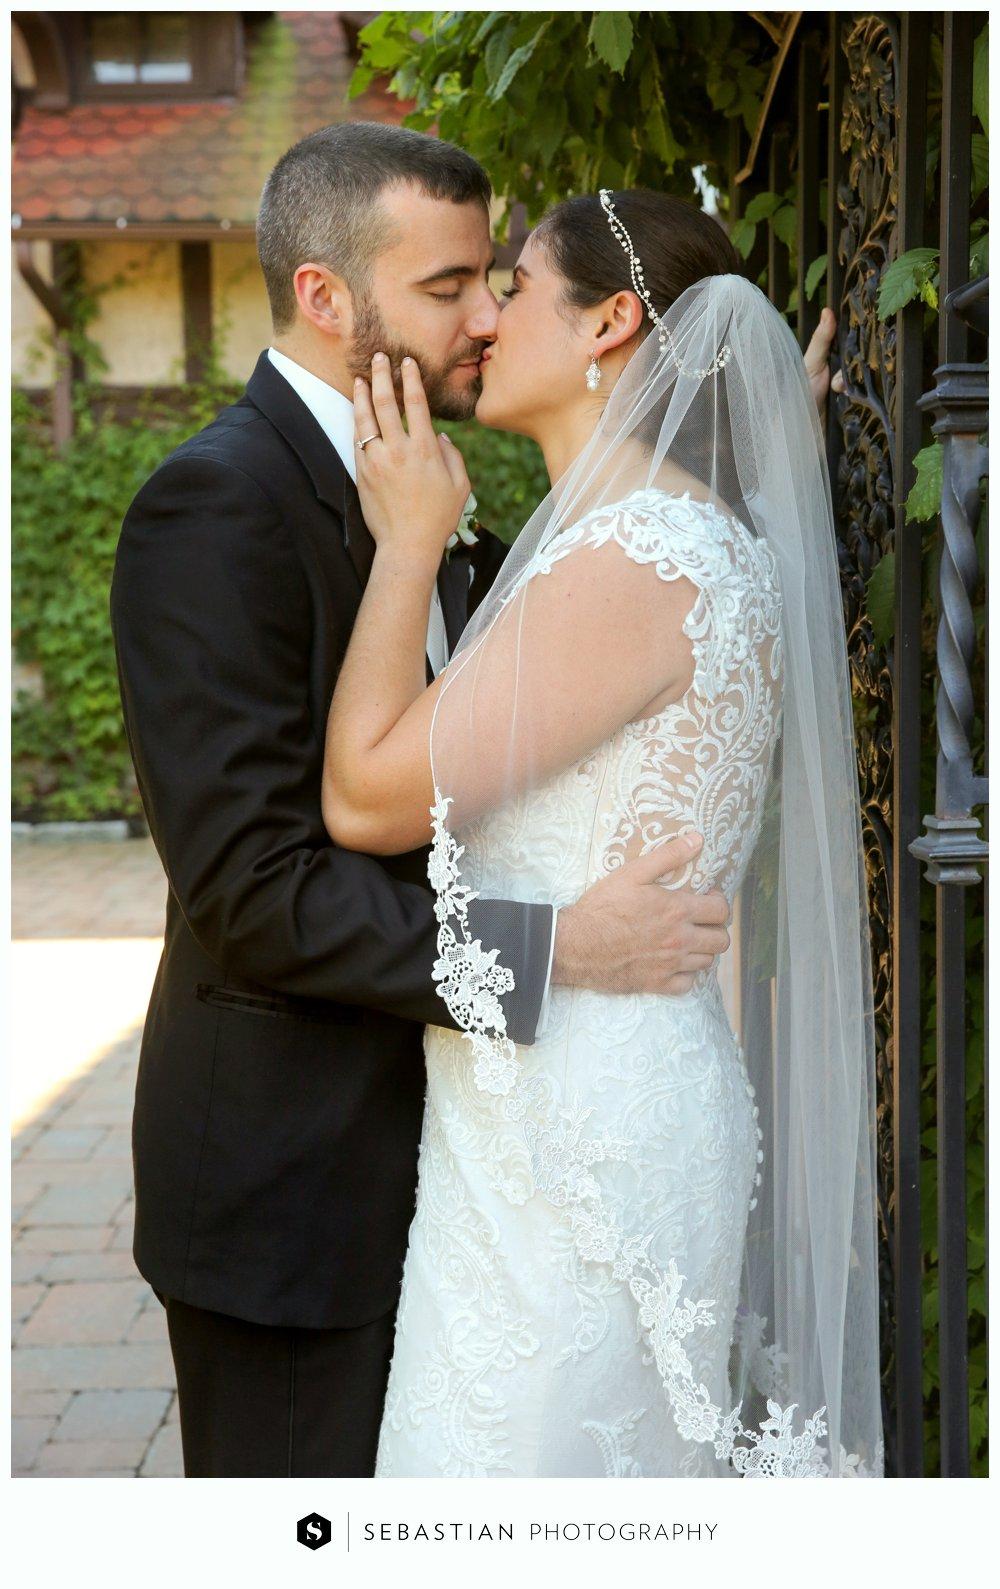 Sebastian Photography_CT Wedding Photographer_SaintClements Wedding_1030.jpg